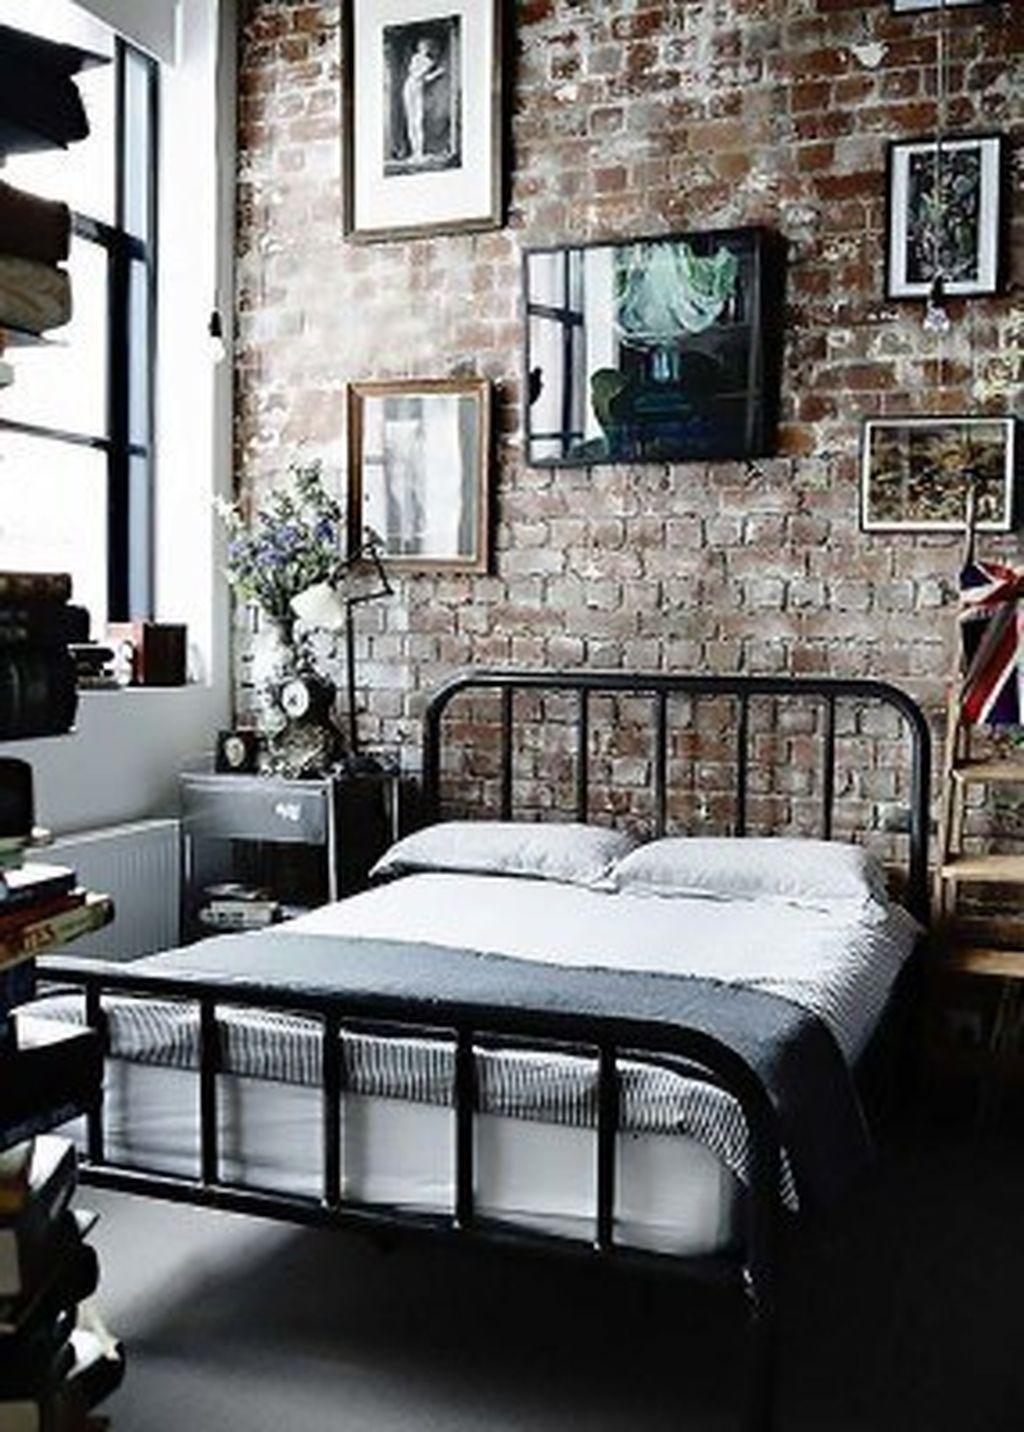 Loft style bedroom ideas   Stunning Loft Style Bedroom Design Ideas  Bedrooms Organisation